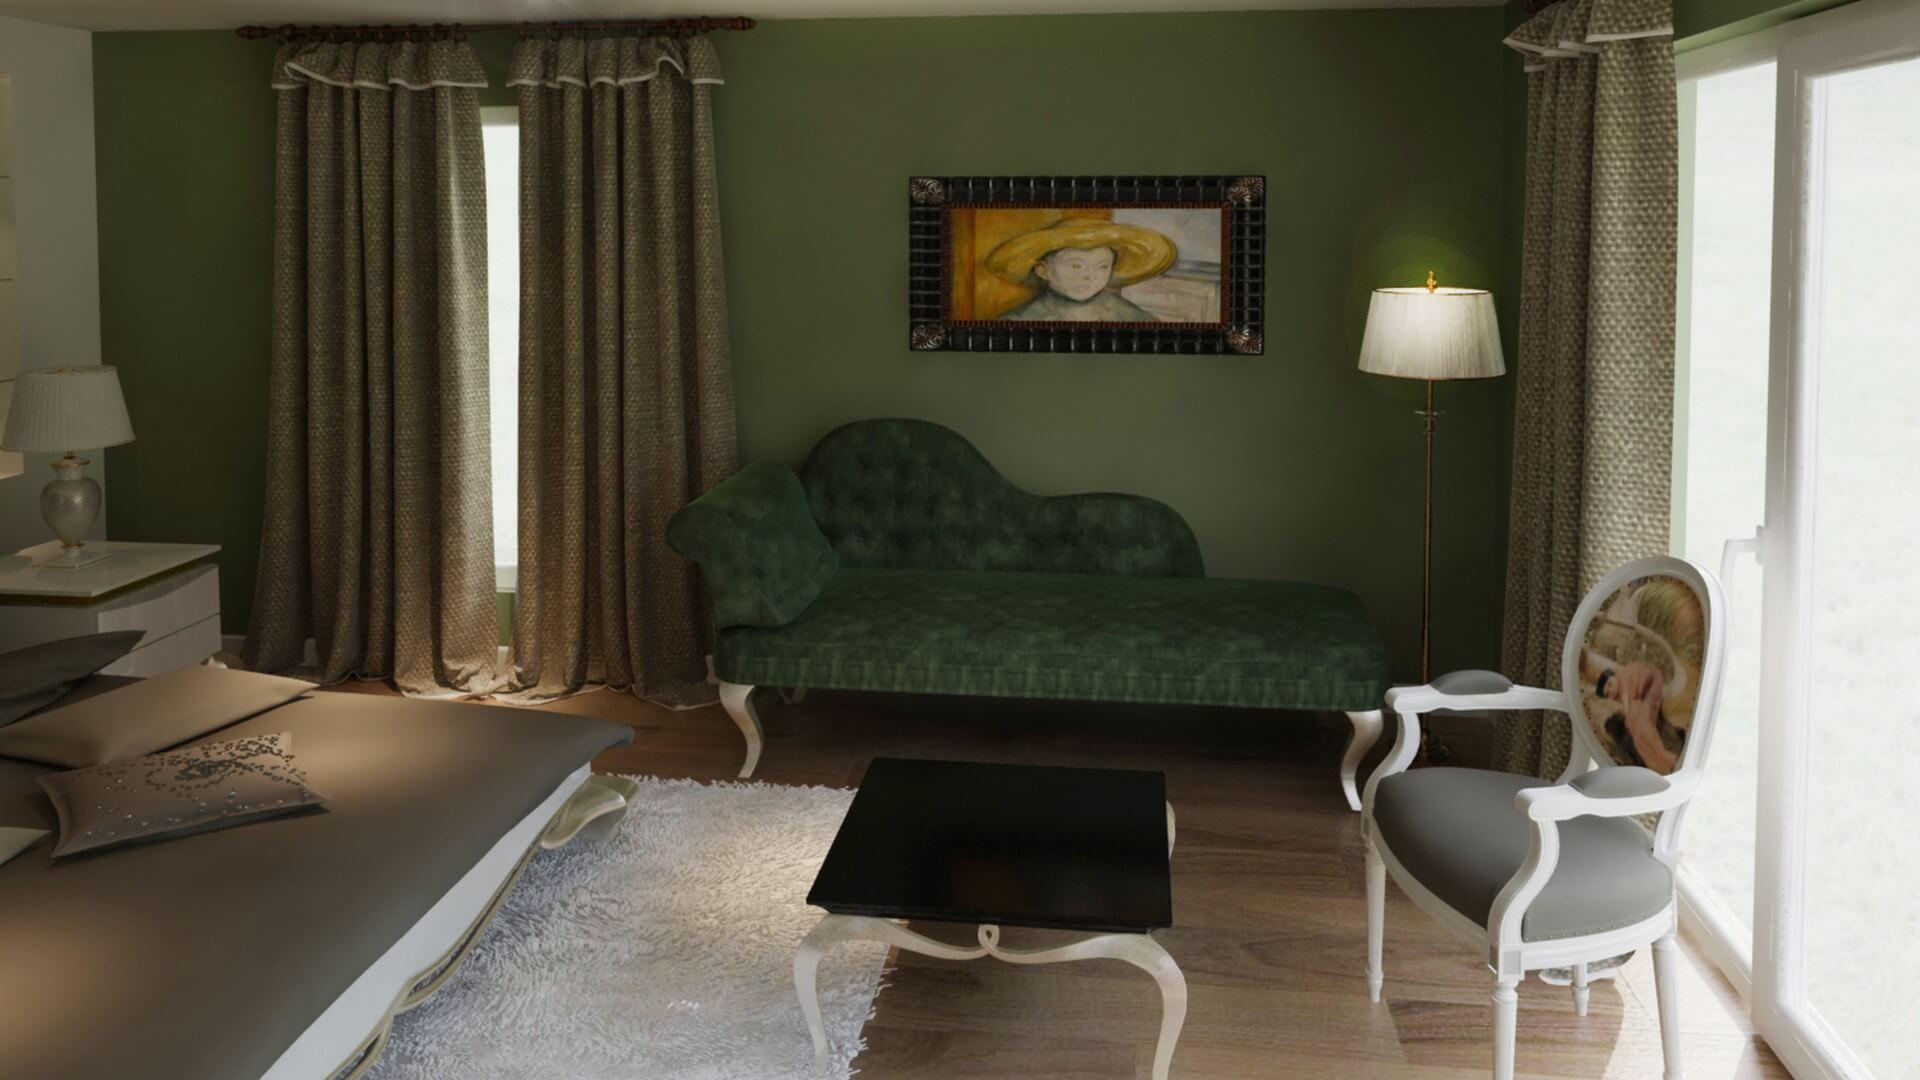 C. Balta House, Residential